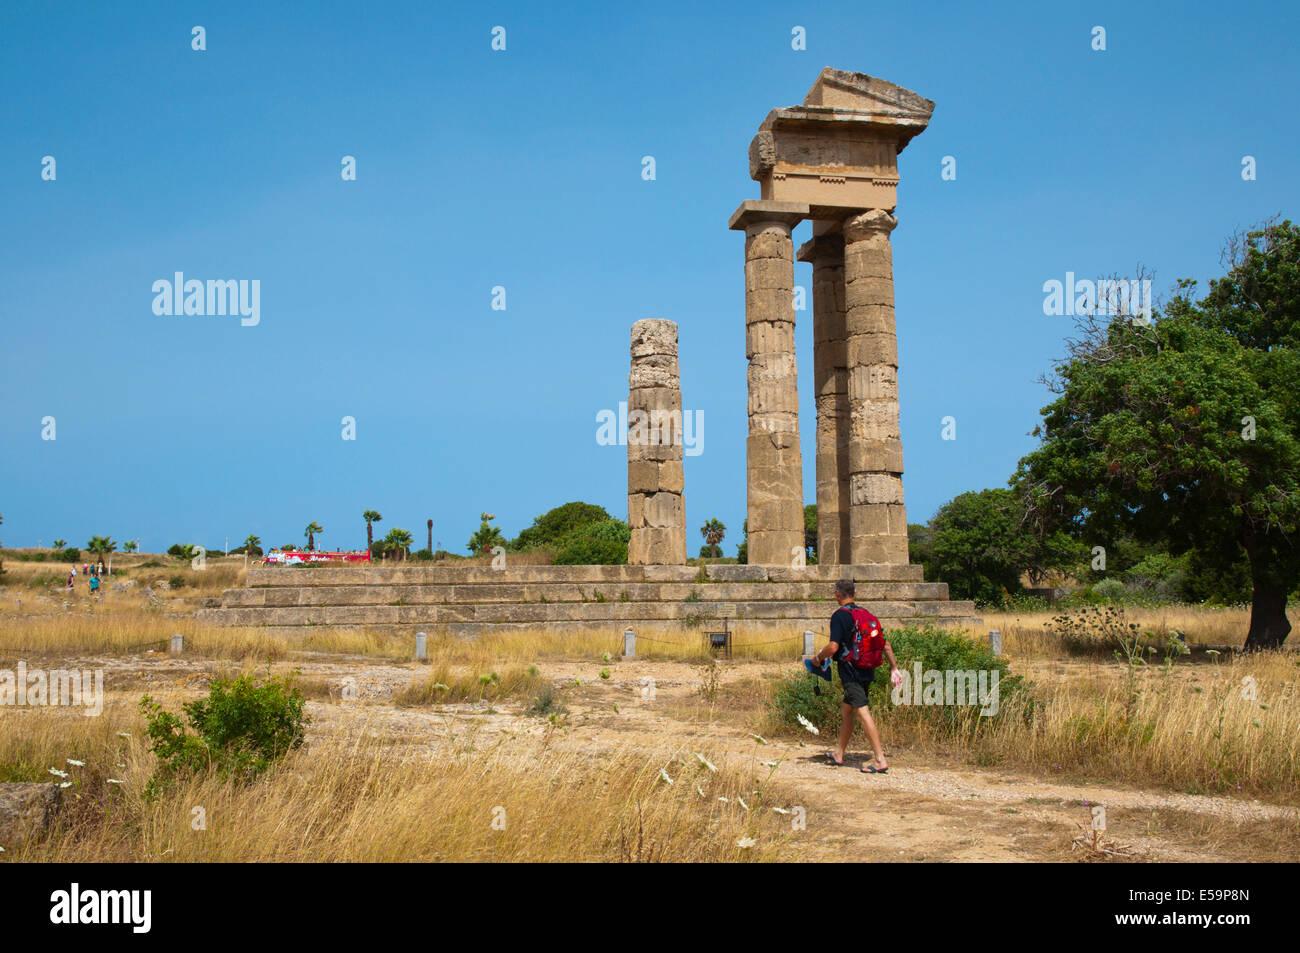 Temple of Apollo, Acropolis Monte Smith, Rhodes town, Rhodes island, Dodecanese, Greece, Europe - Stock Image